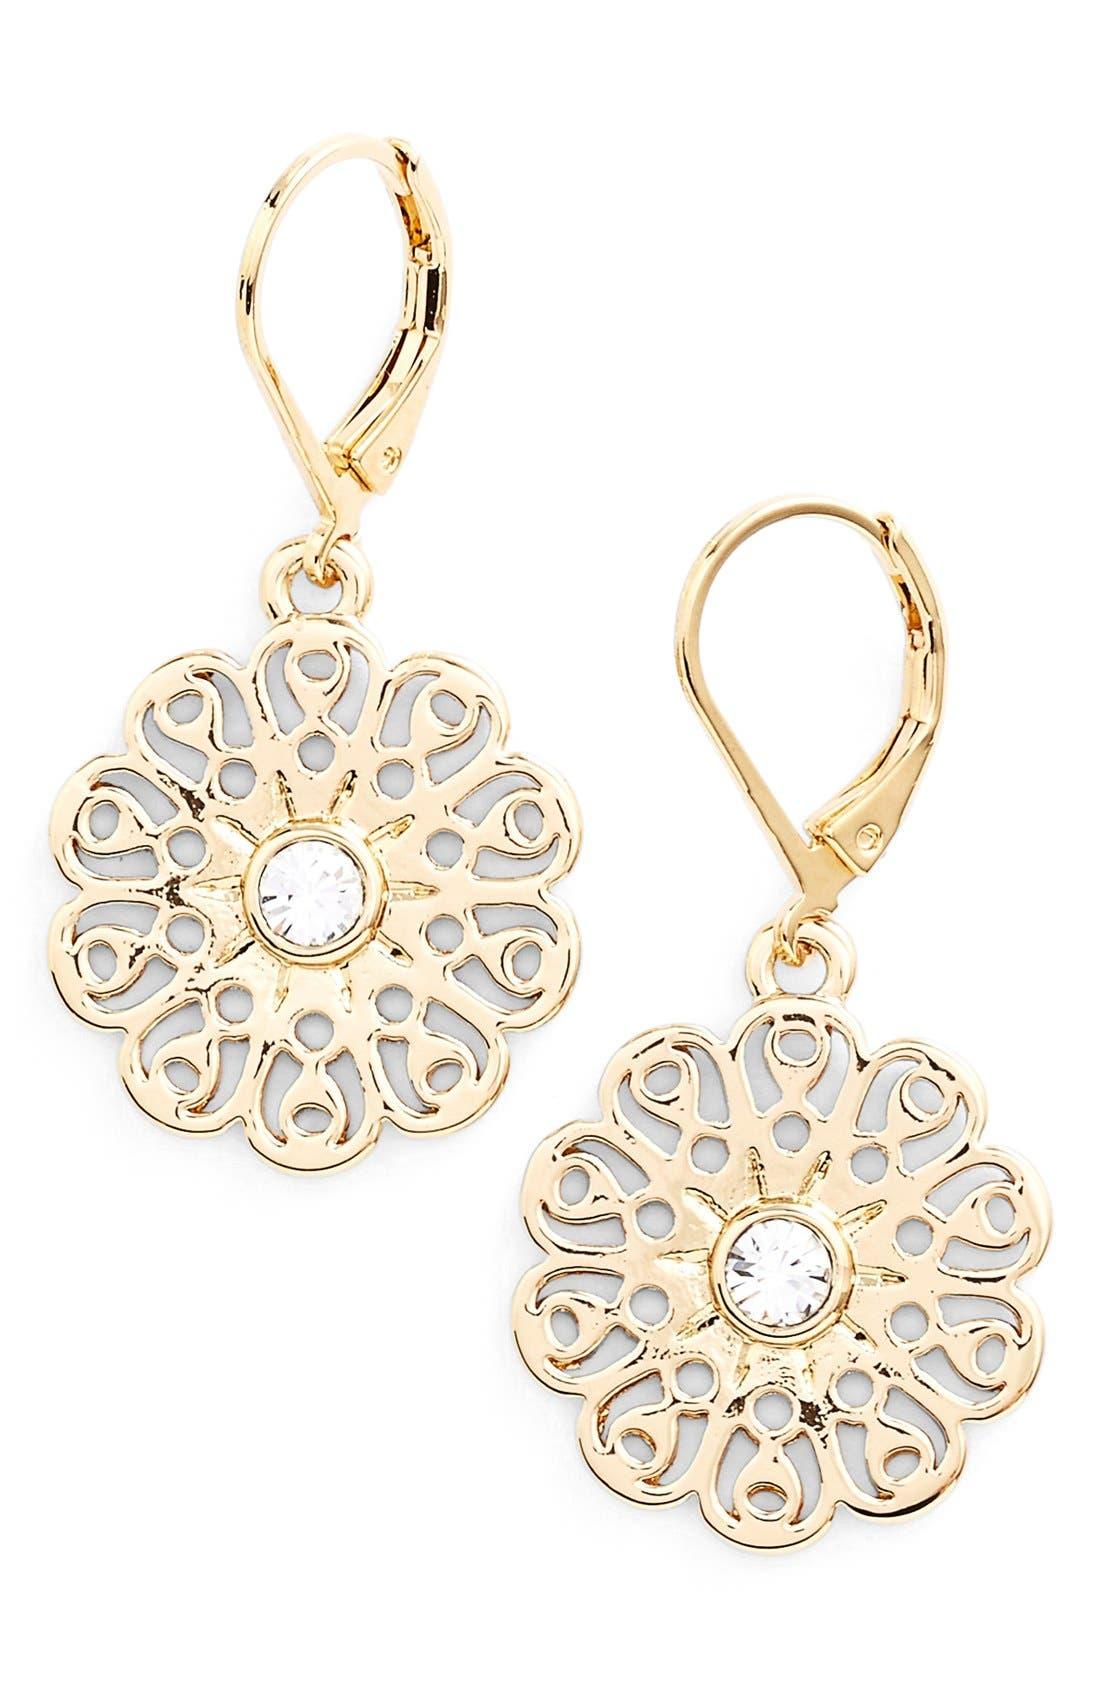 Main Image - katespade new york'strike gold' drop earrings